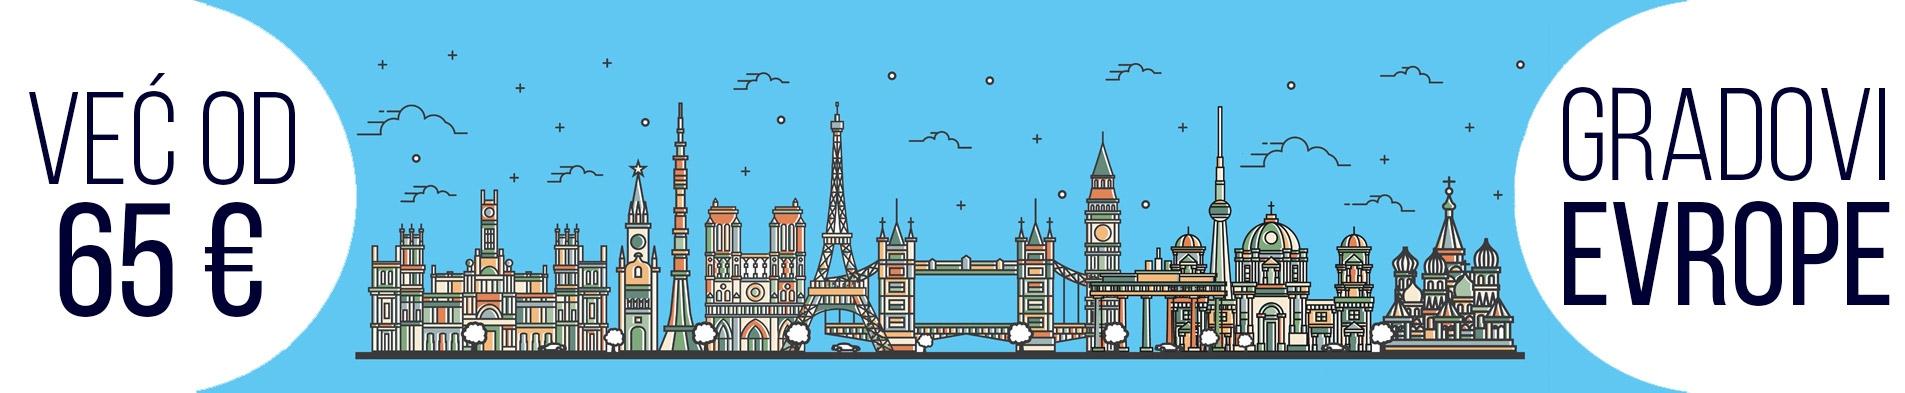 Gradovi Evrope jesenja putovanja naslovna slajder